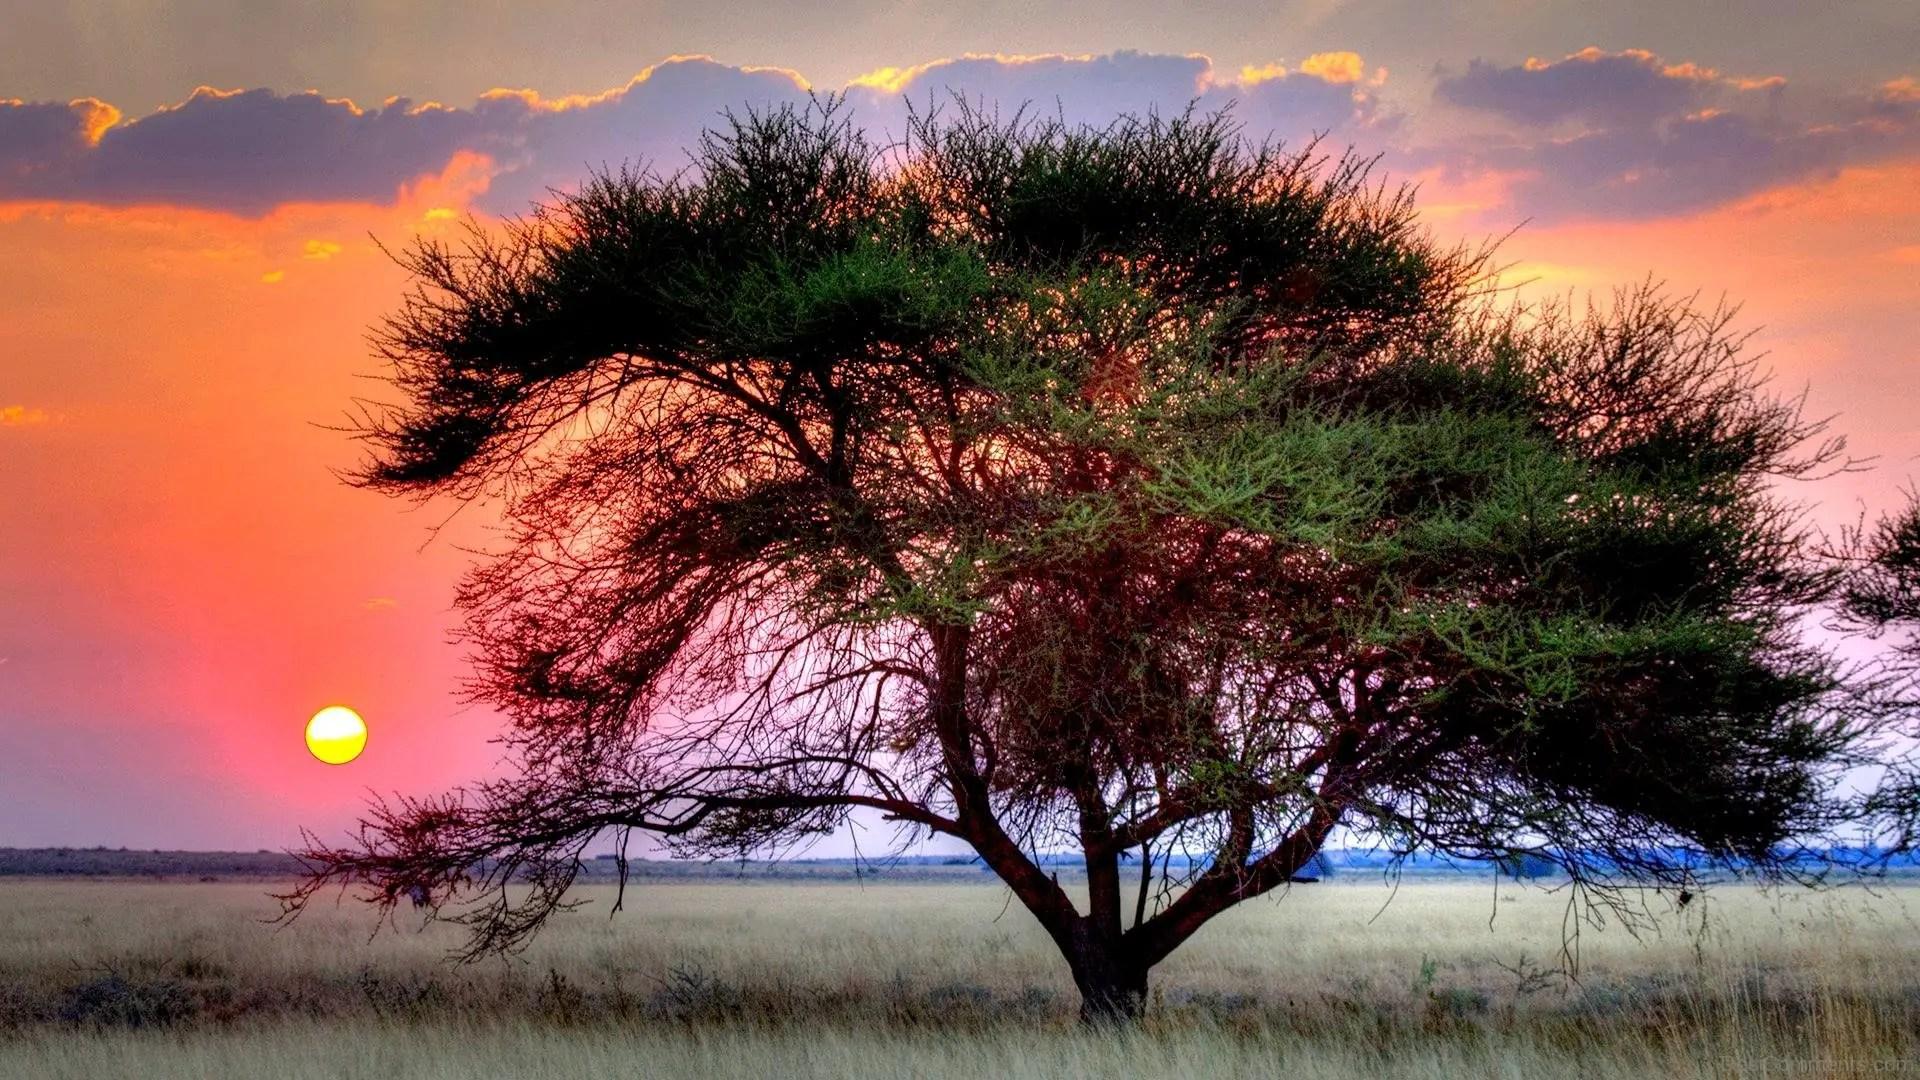 Hindi Sad Wallpaper Quotes Kalahari Desert And Sun Set Desicomments Com